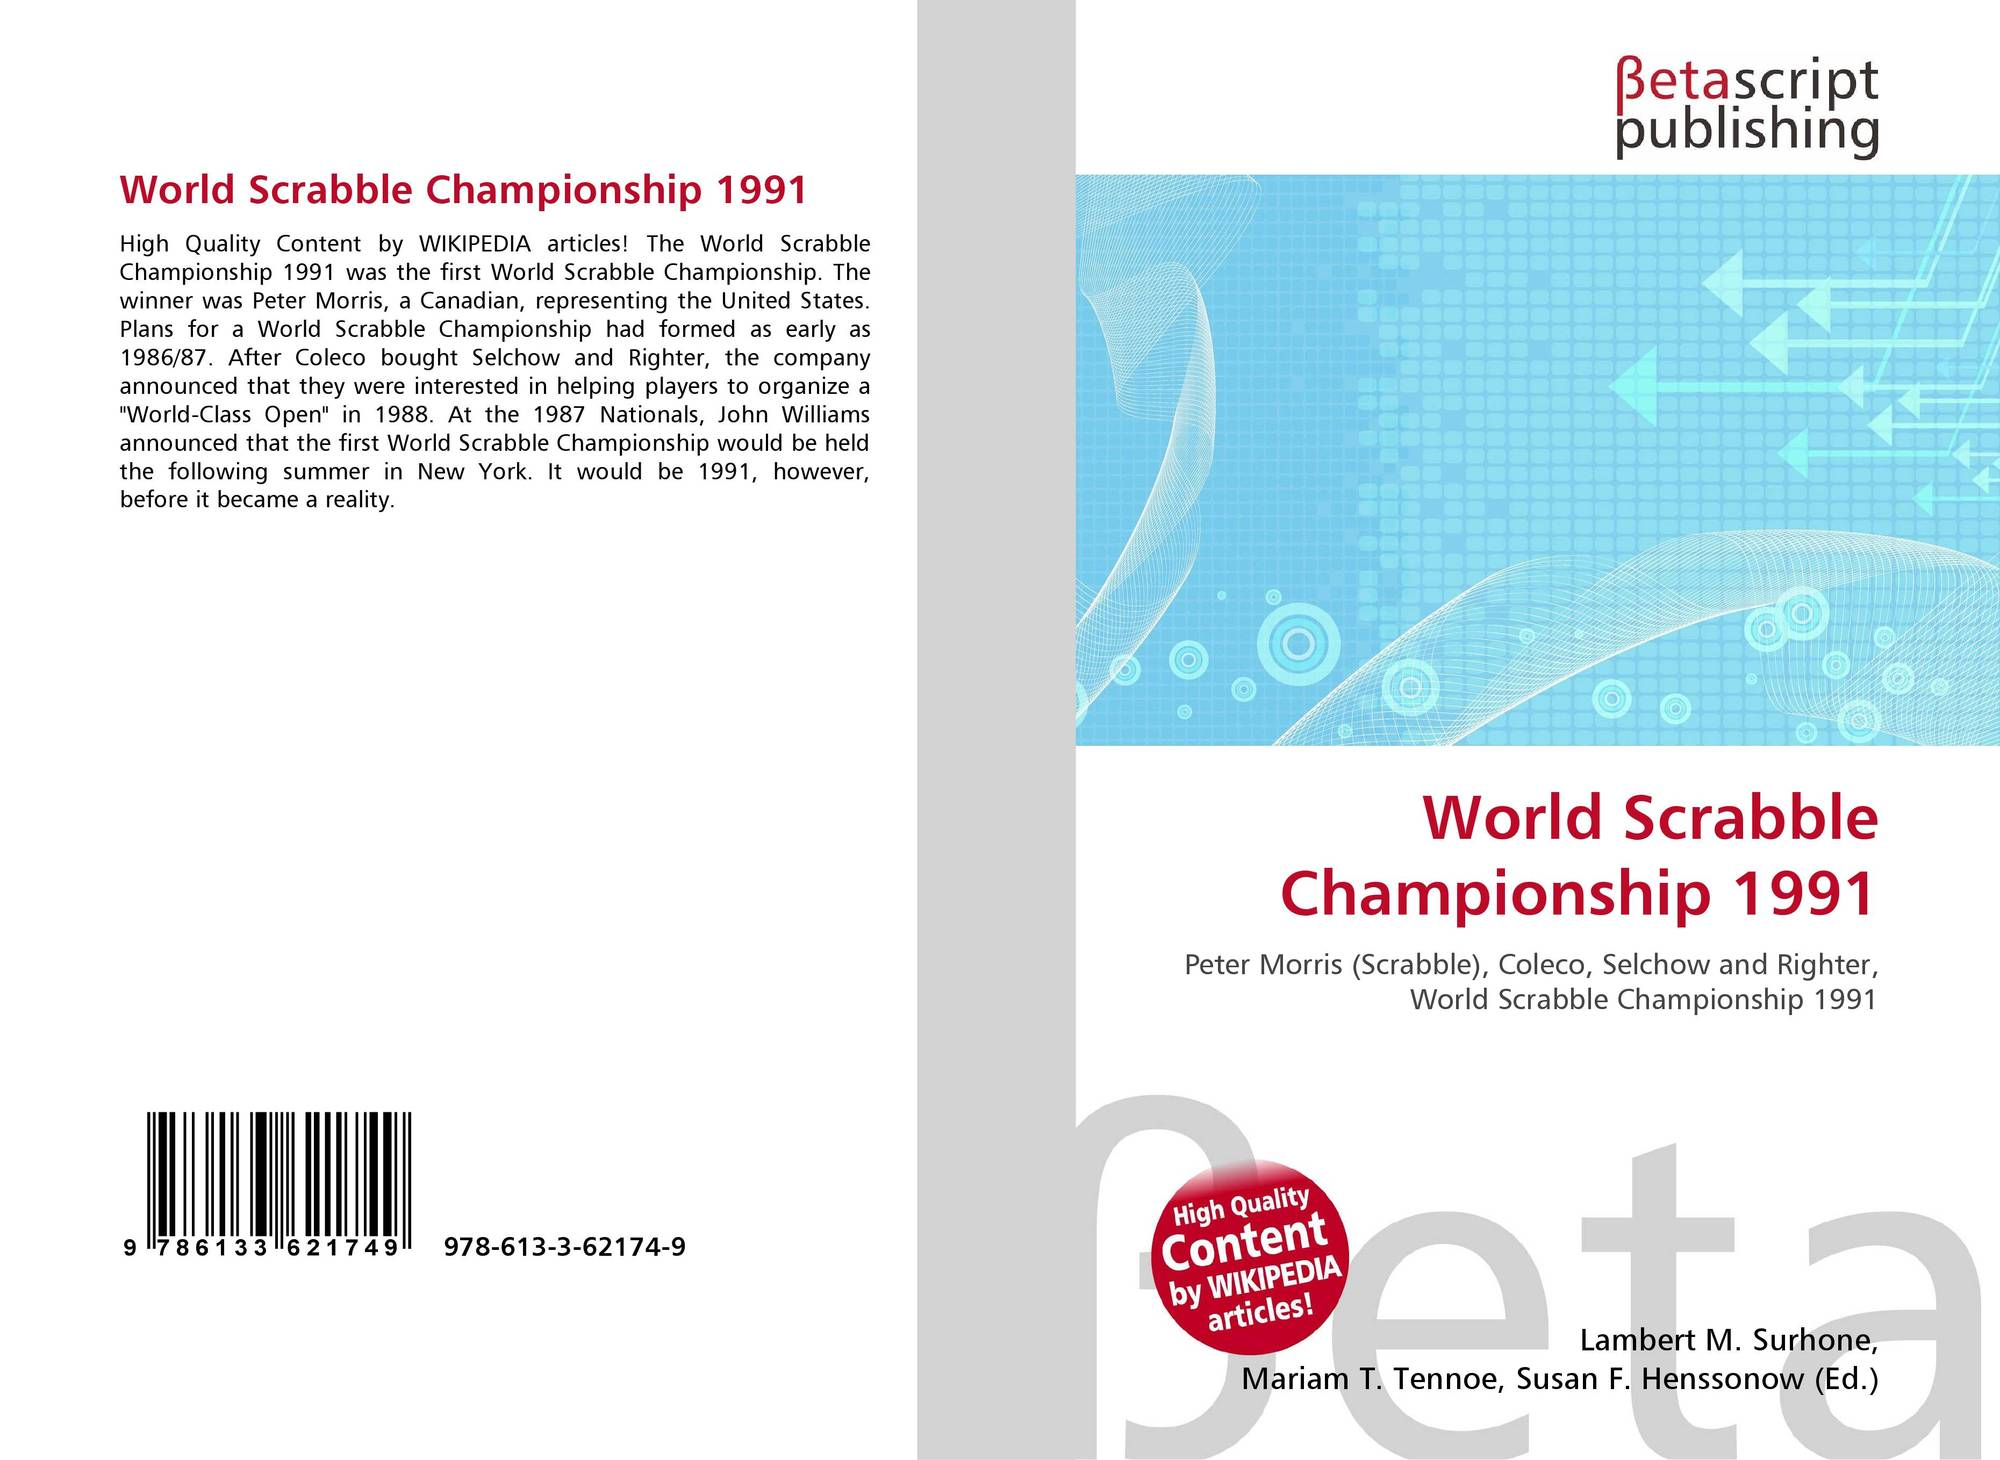 World Scrabble Championship 1991, 978-613-3-62174-9